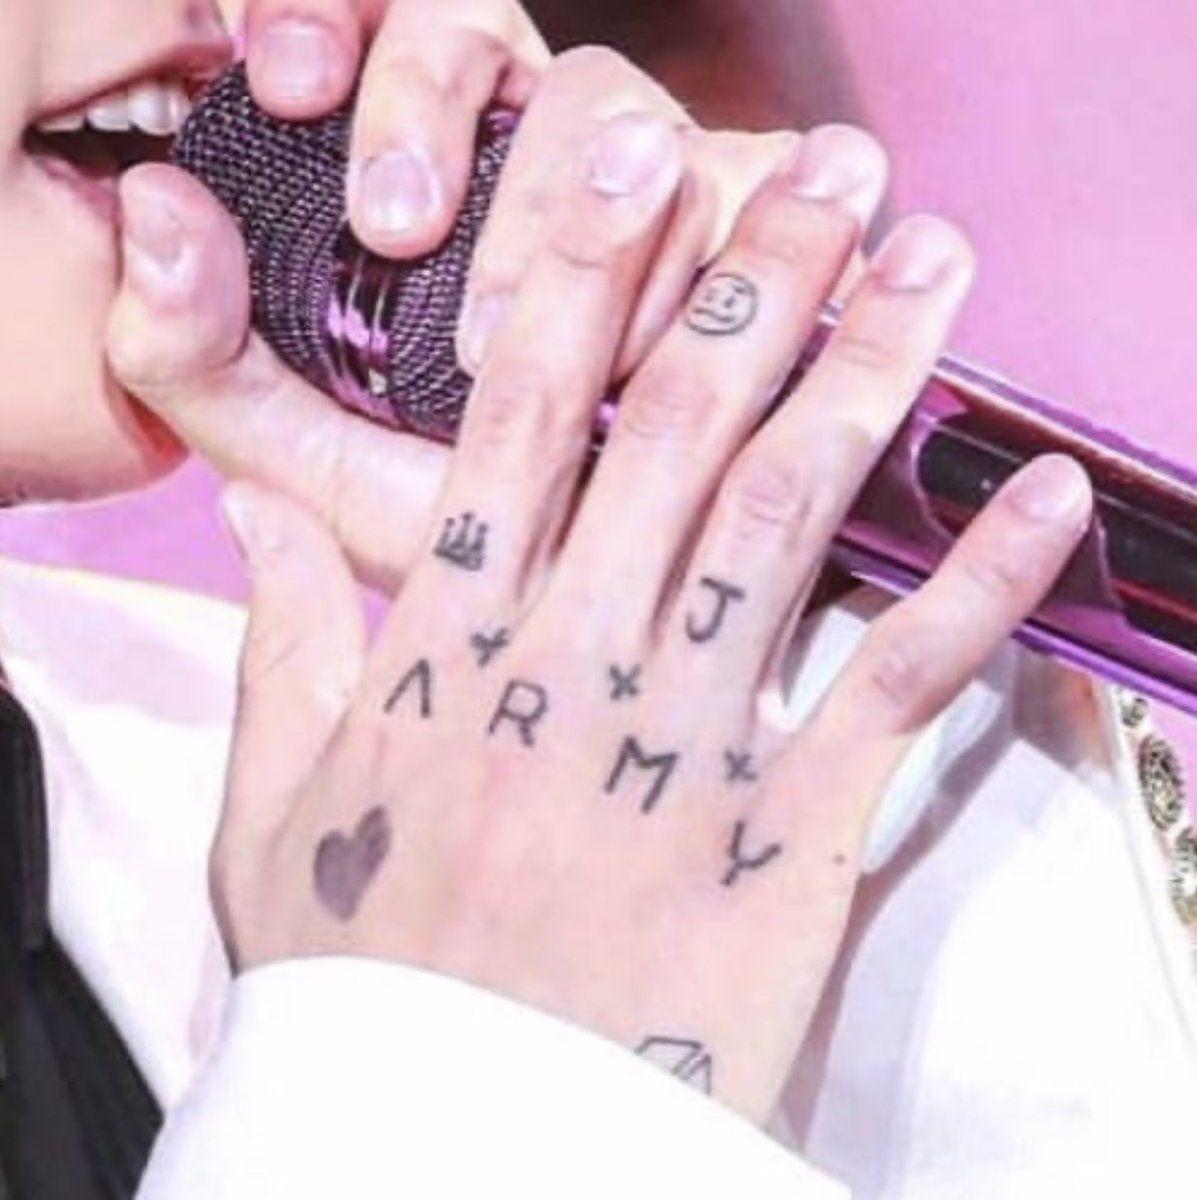 Tnaℓia Arsd On Em 2020 Tatuagem Oppa